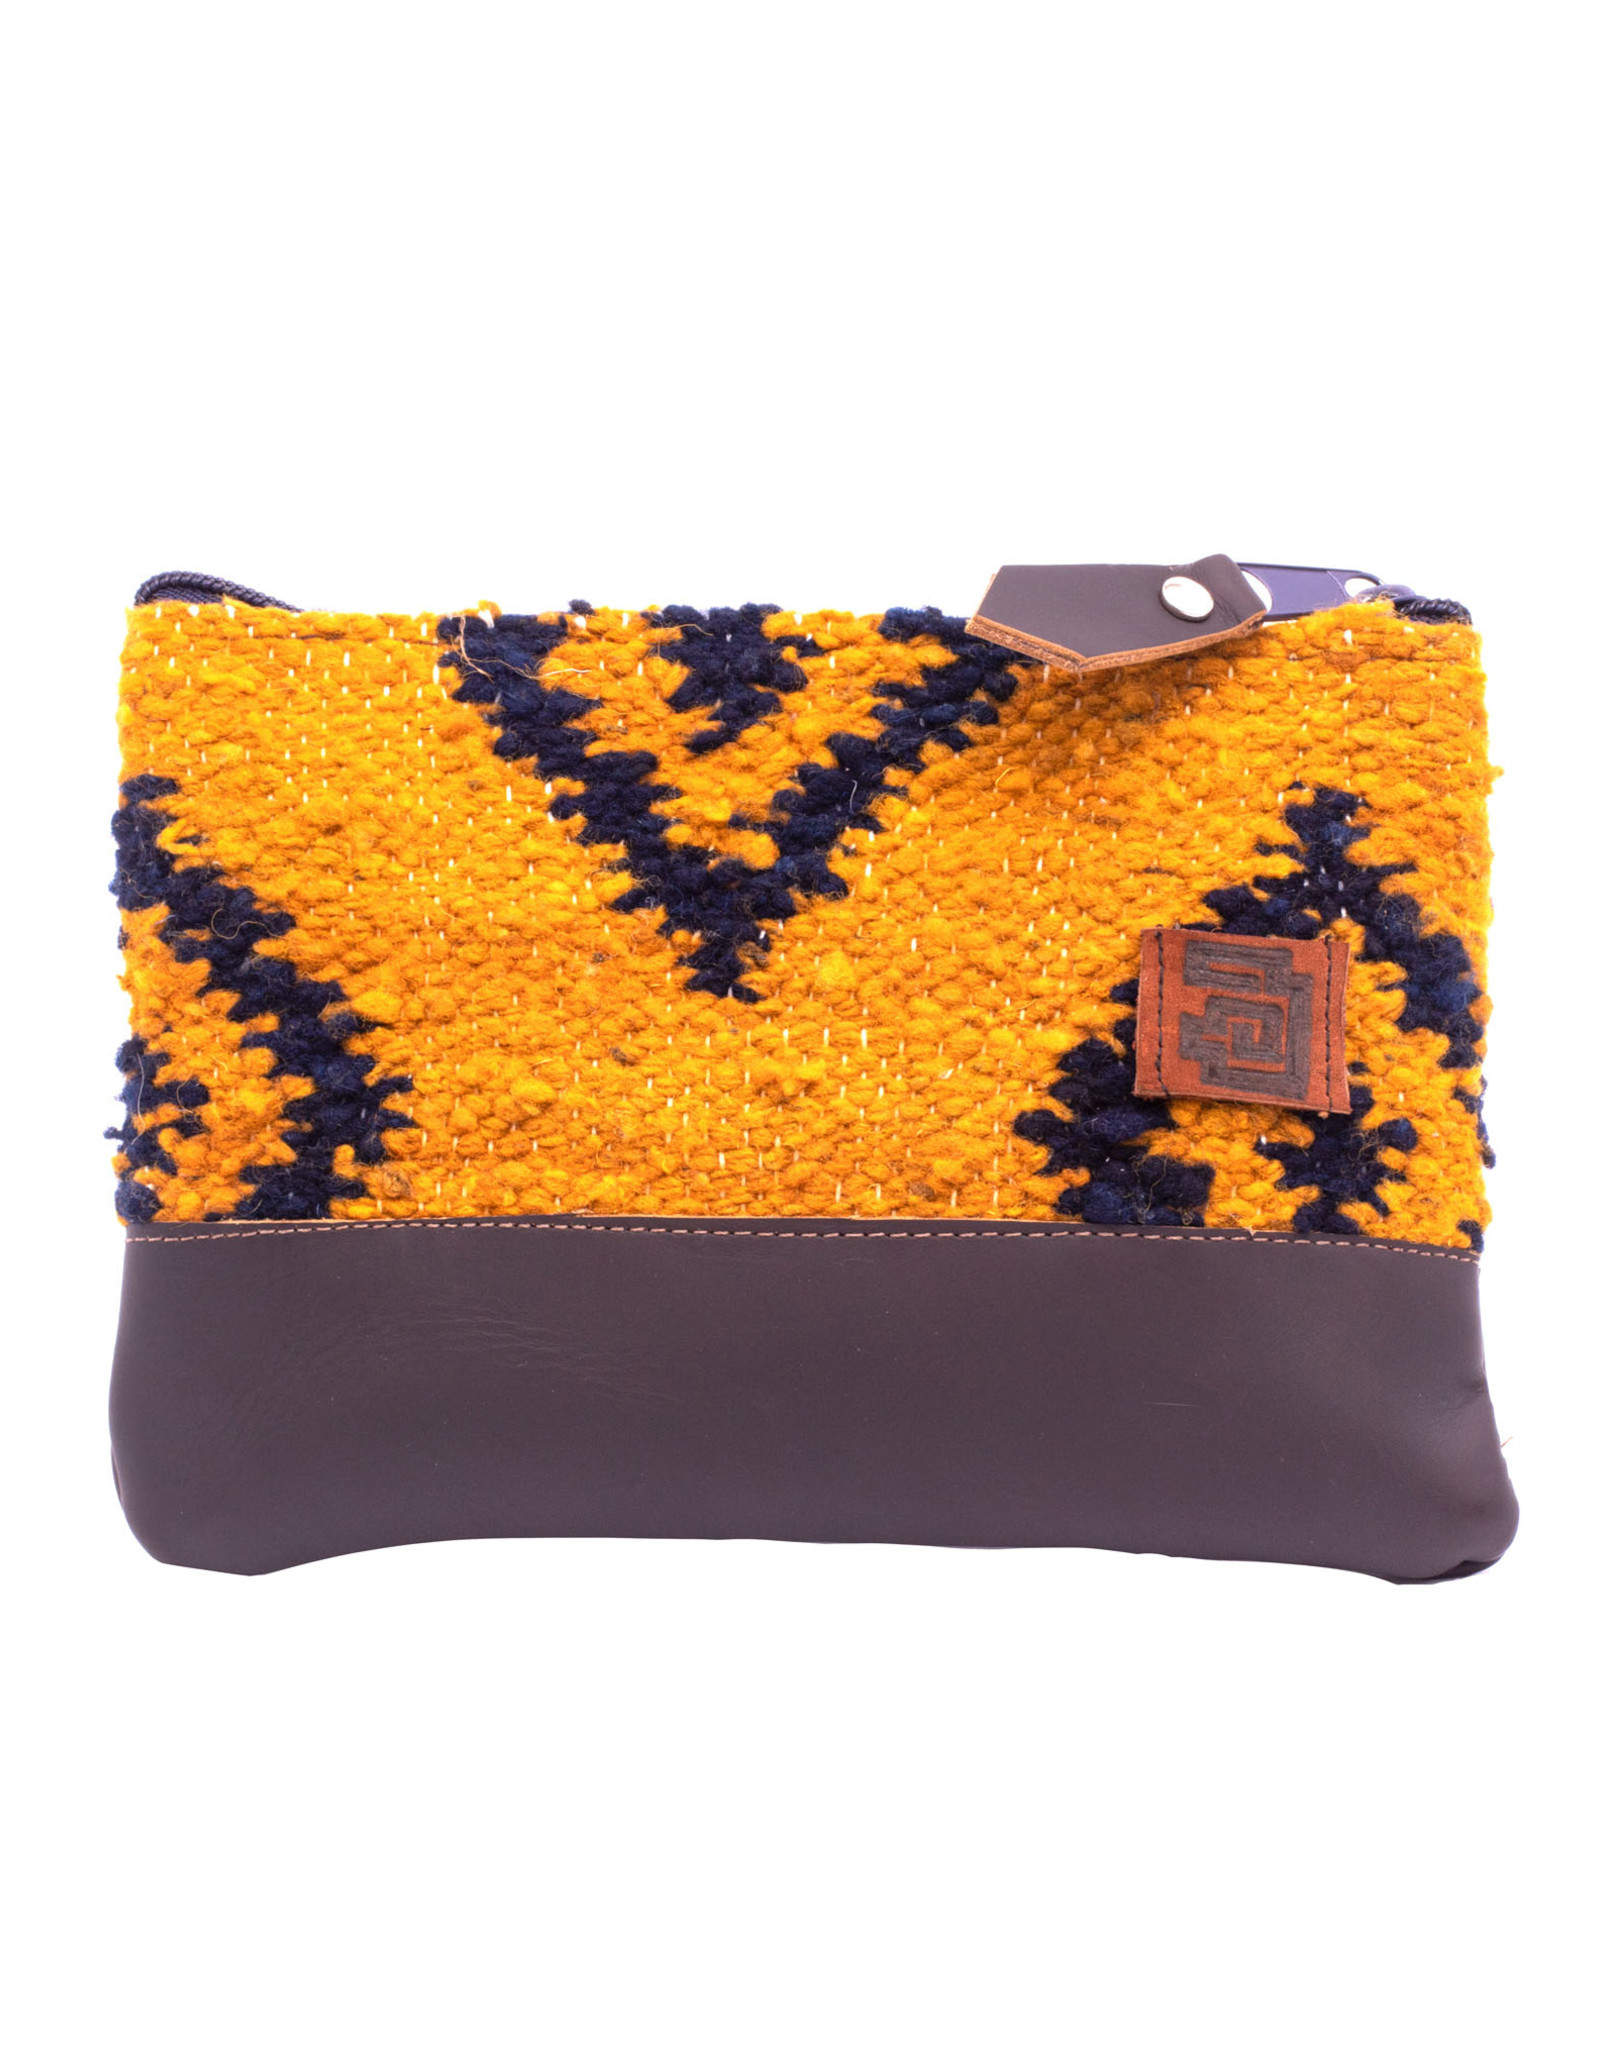 Elementos Wool Pouch - Fuego